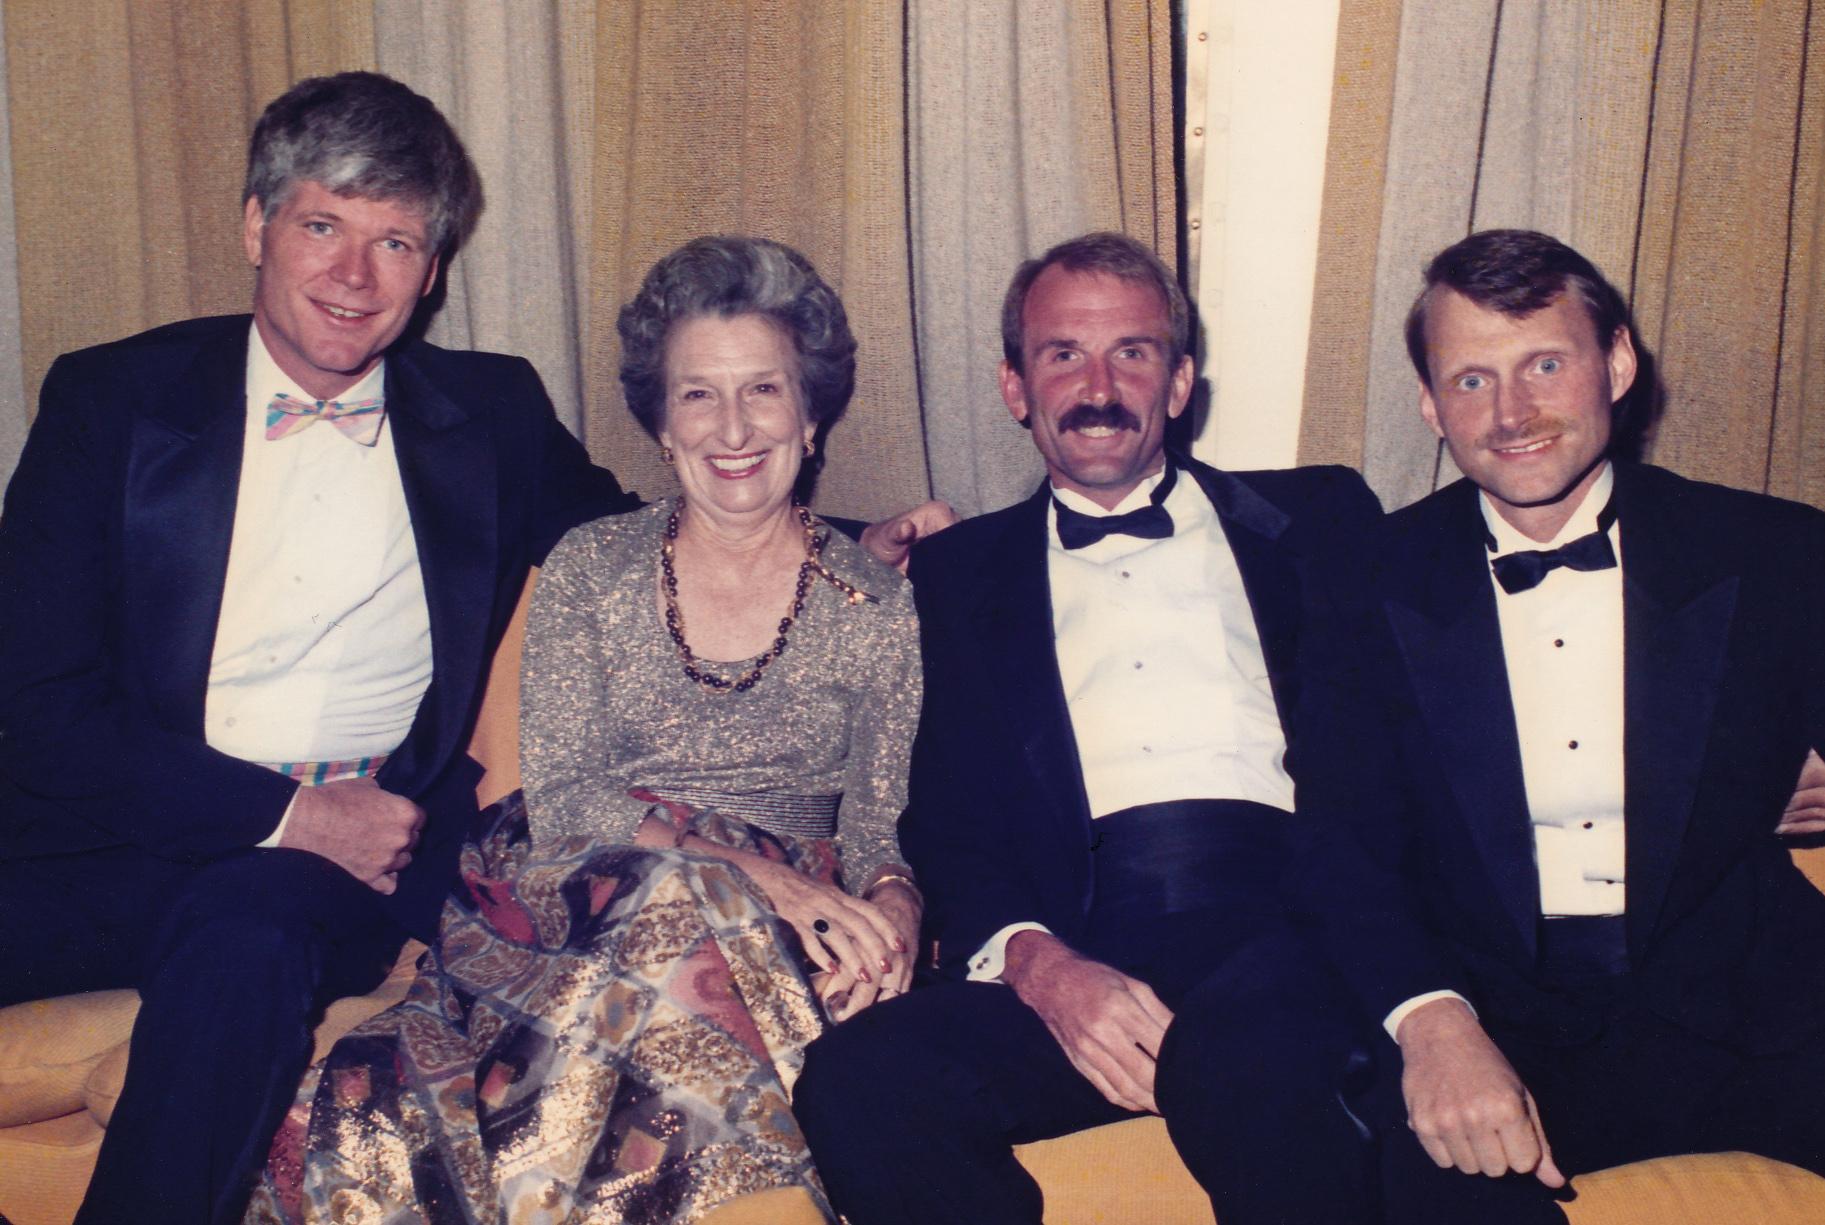 [Left to right] John Thomas, Jean Nelson (Bill's mother), Bill Nelson, Terry Tebedo